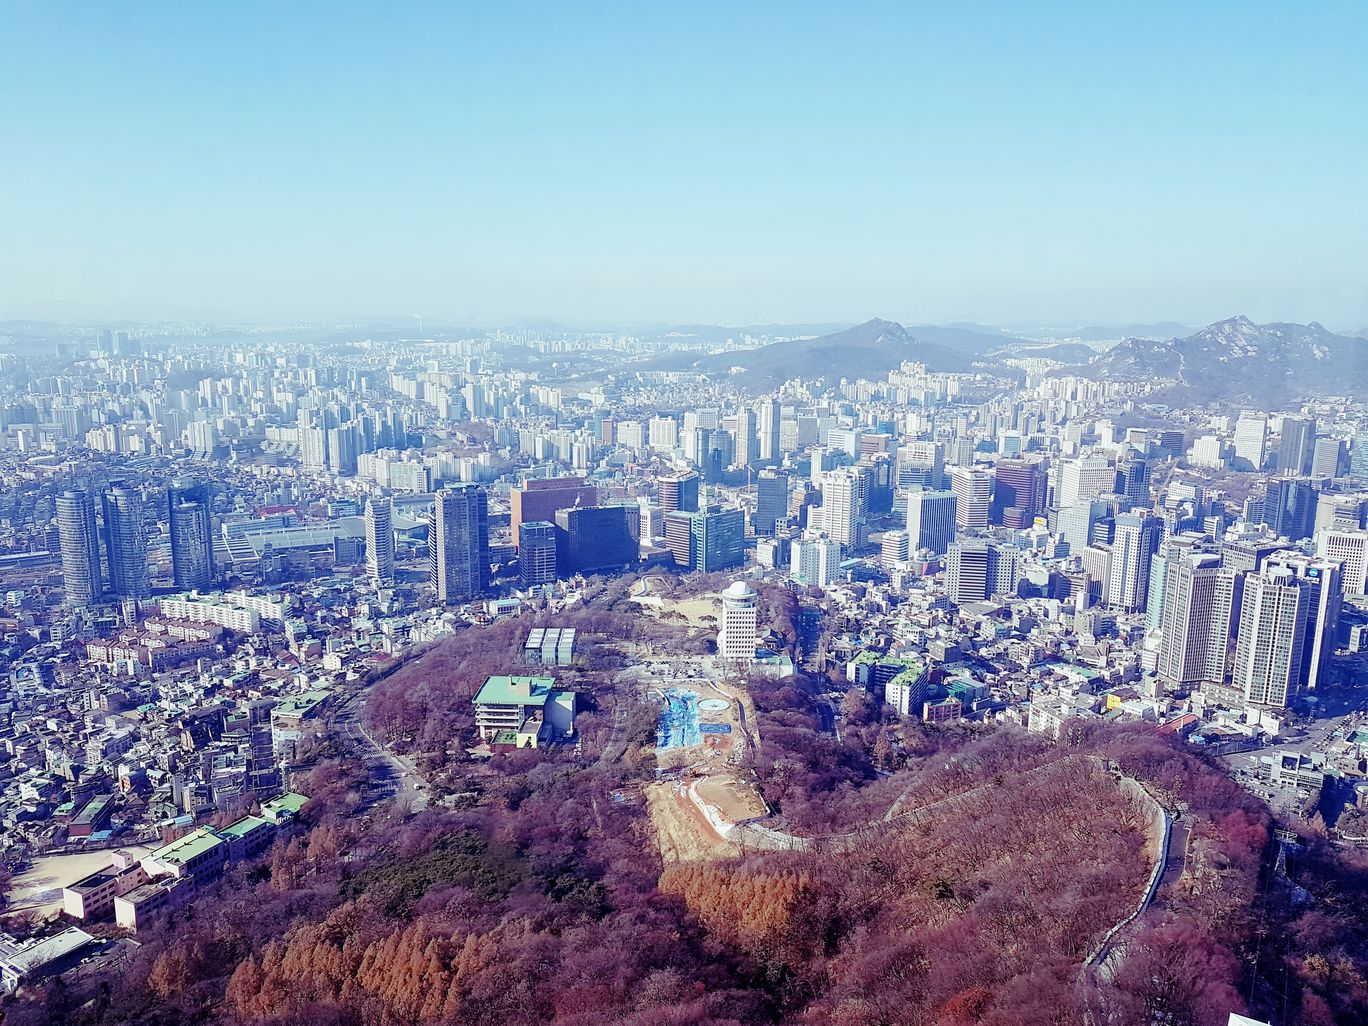 Photo of Seoul By Kapil Kumar